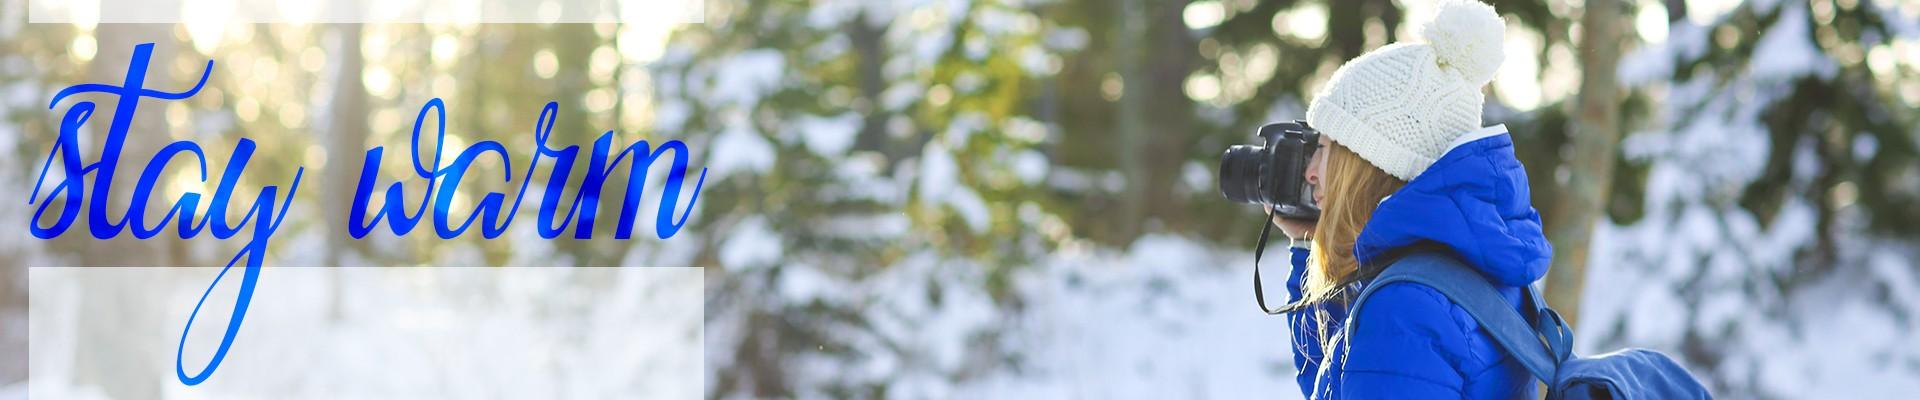 Winter camping and outdoor gear checklist: Apparel